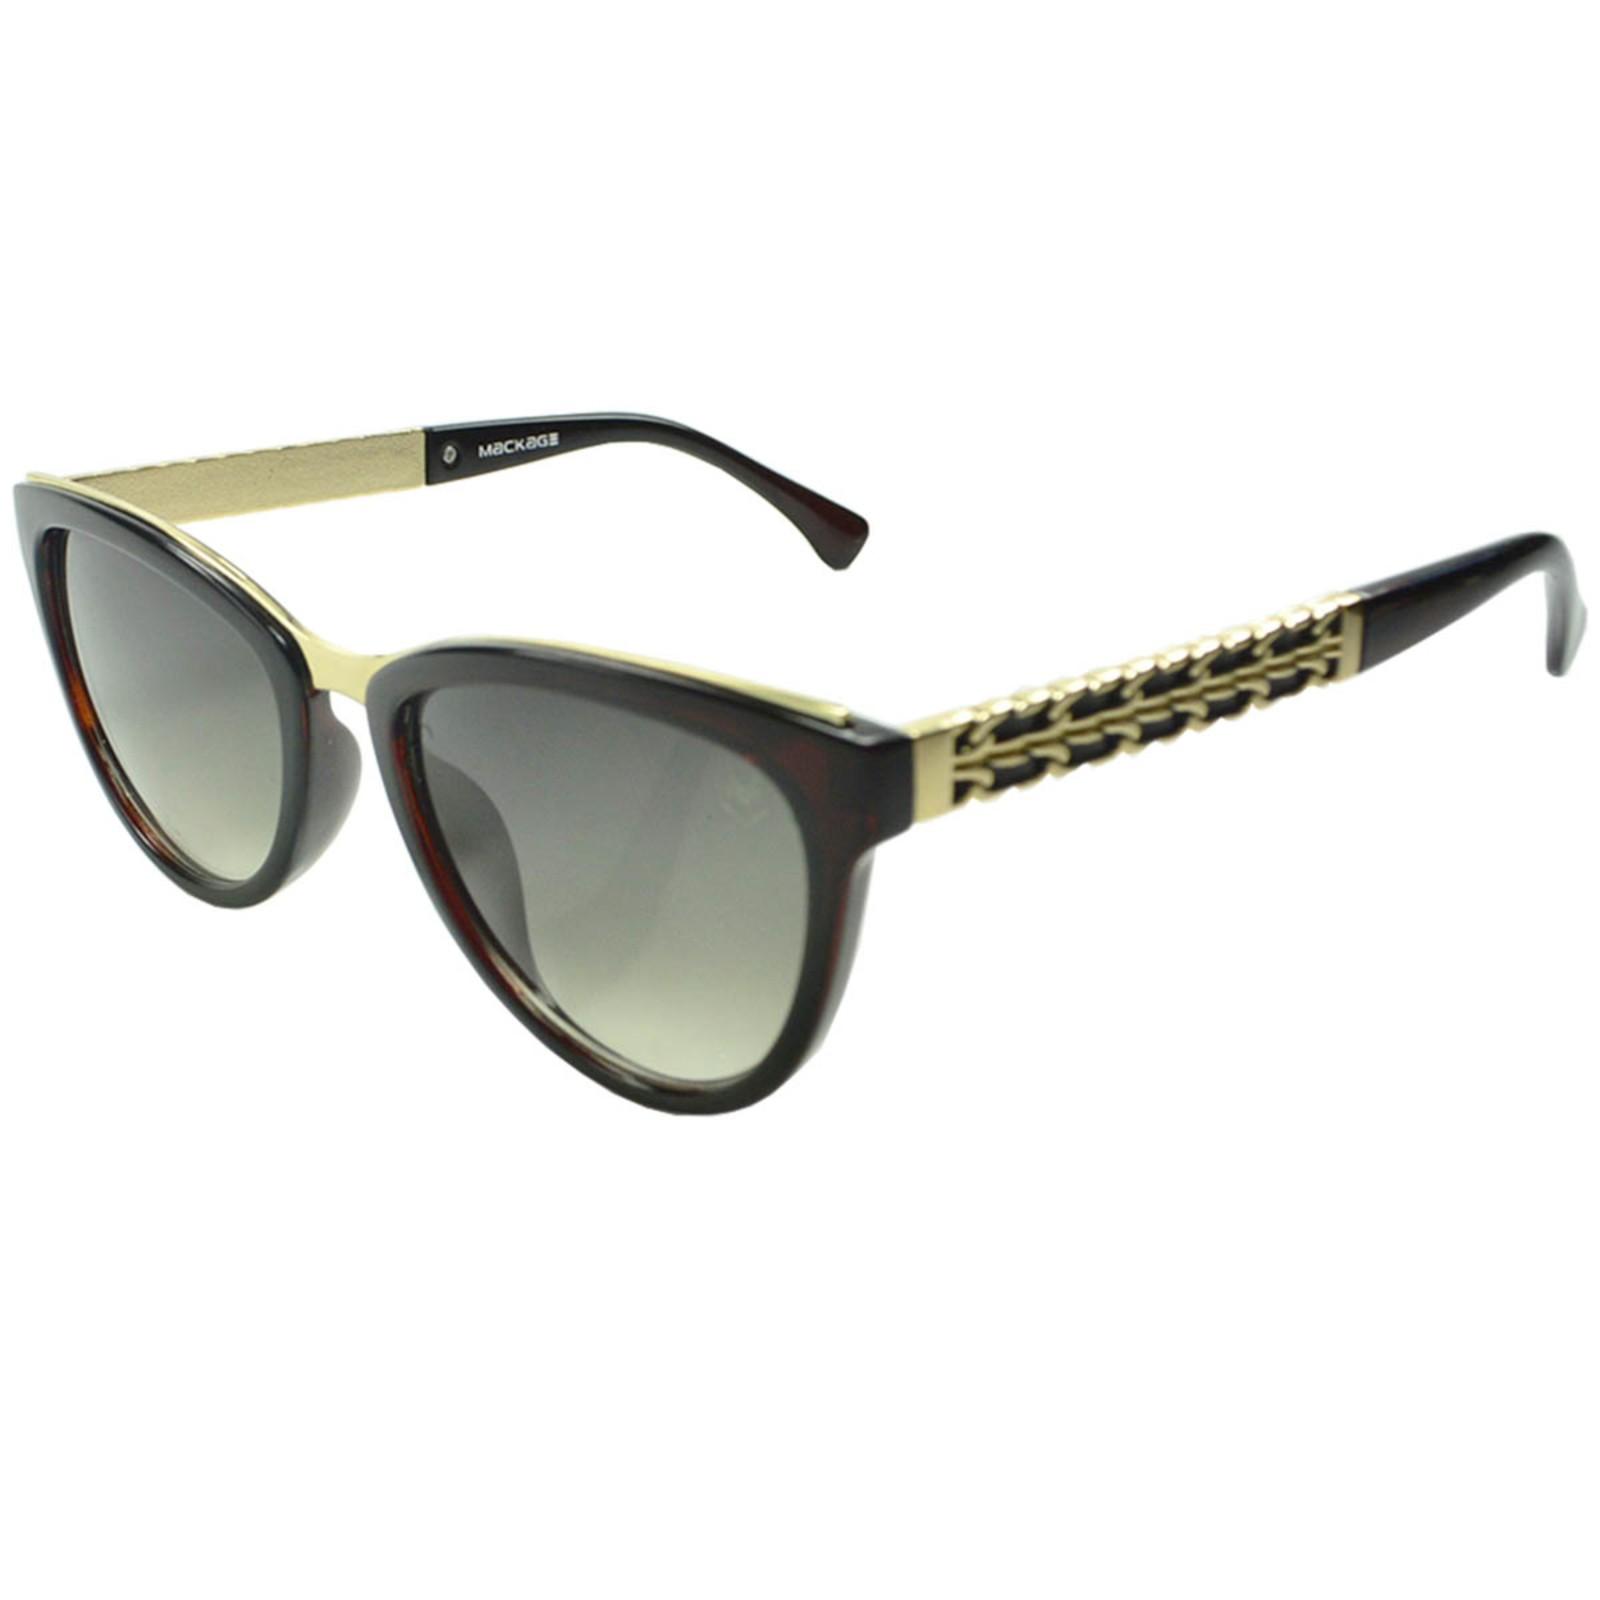 Óculos De Sol Mackage Feminino Acetato Gateado - Marrom